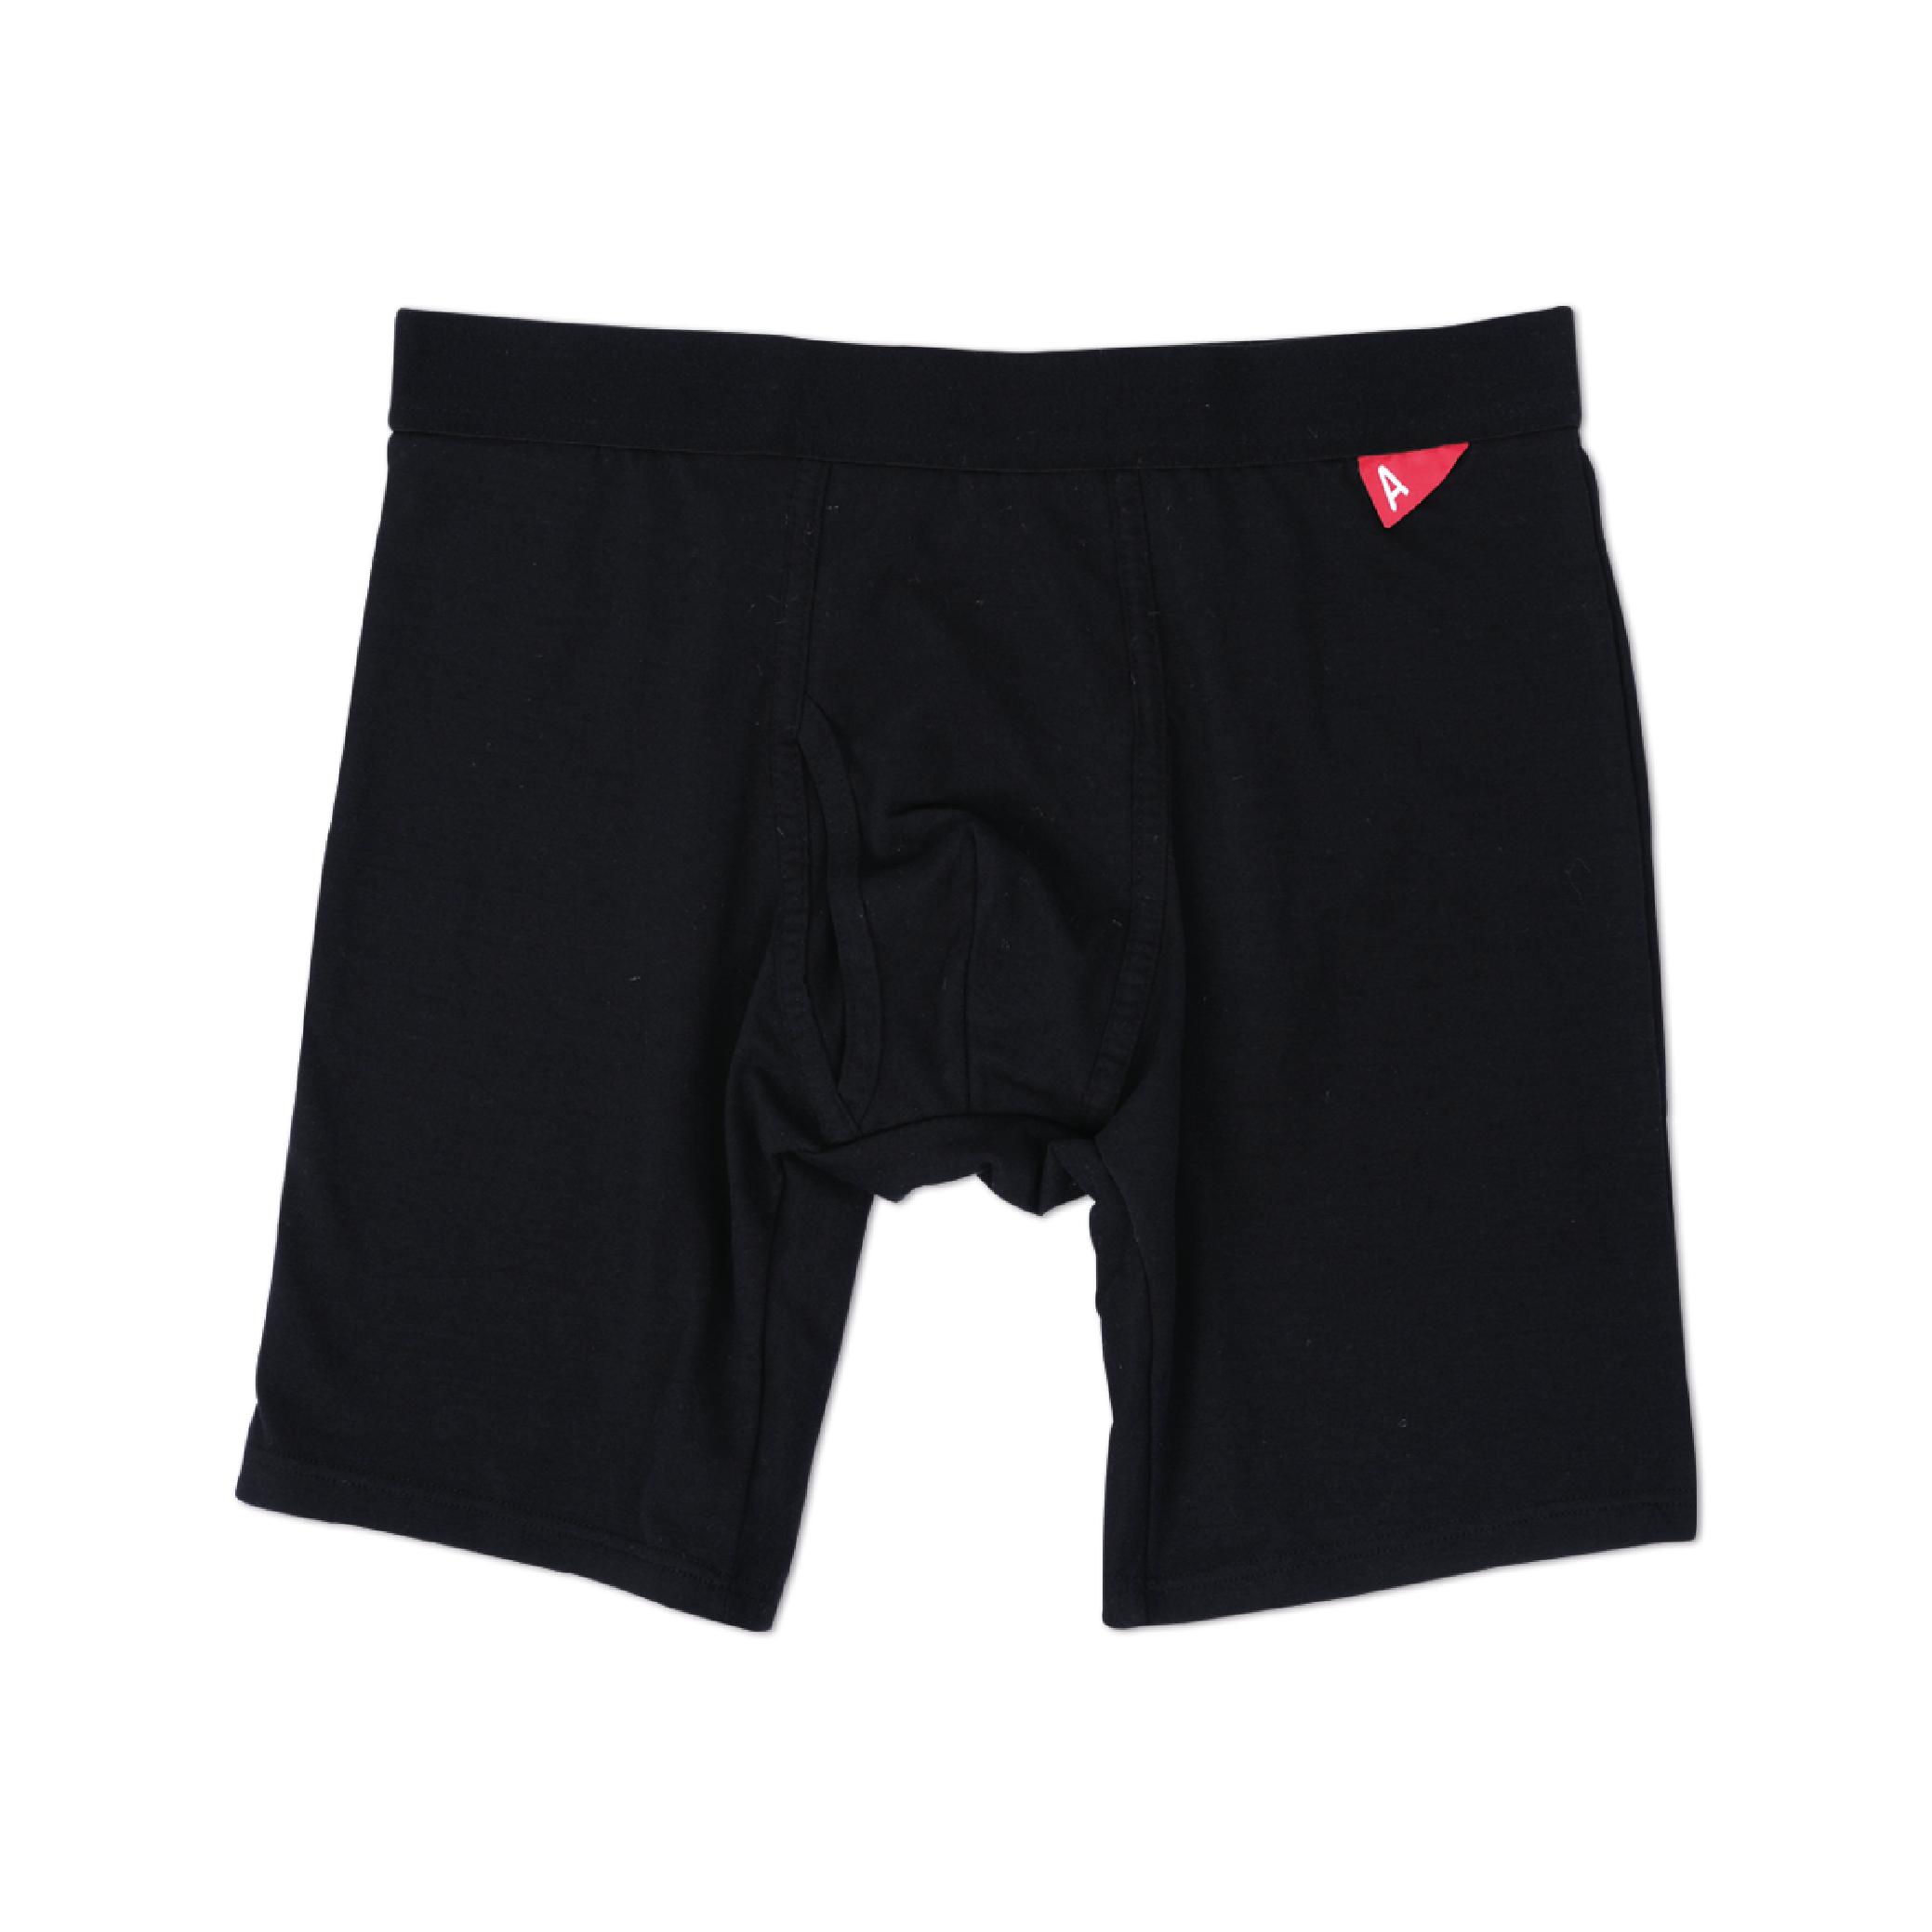 Boxer Brief Black-01.png